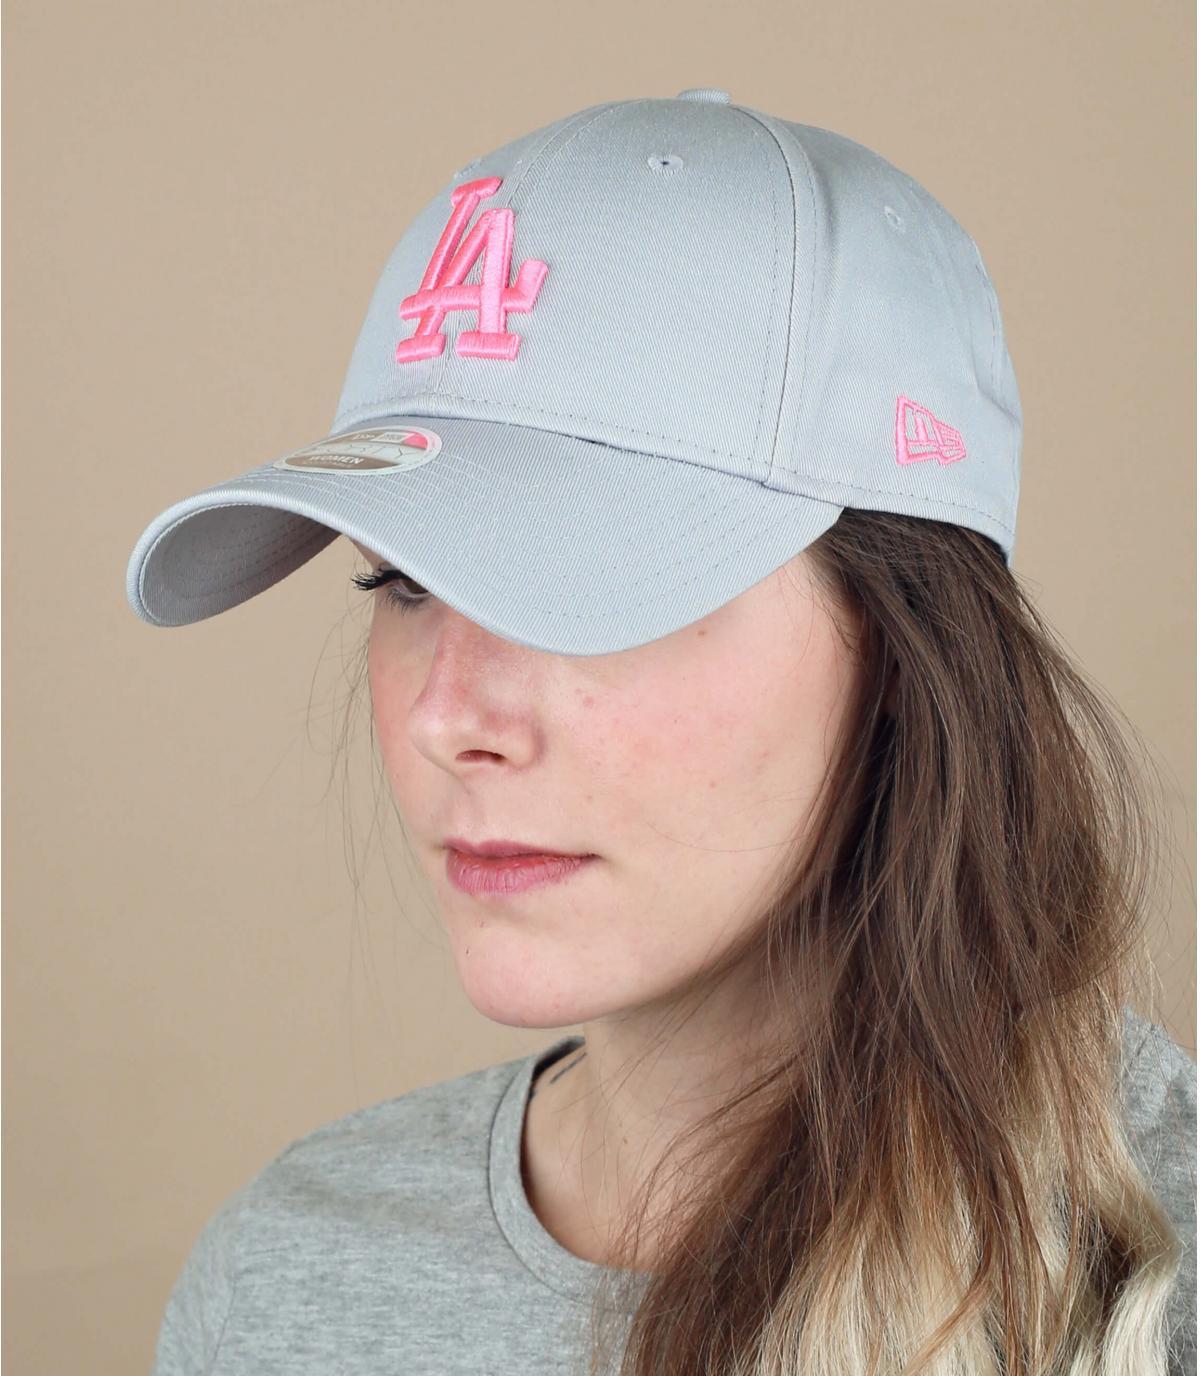 gorra mujer LA gris rosa